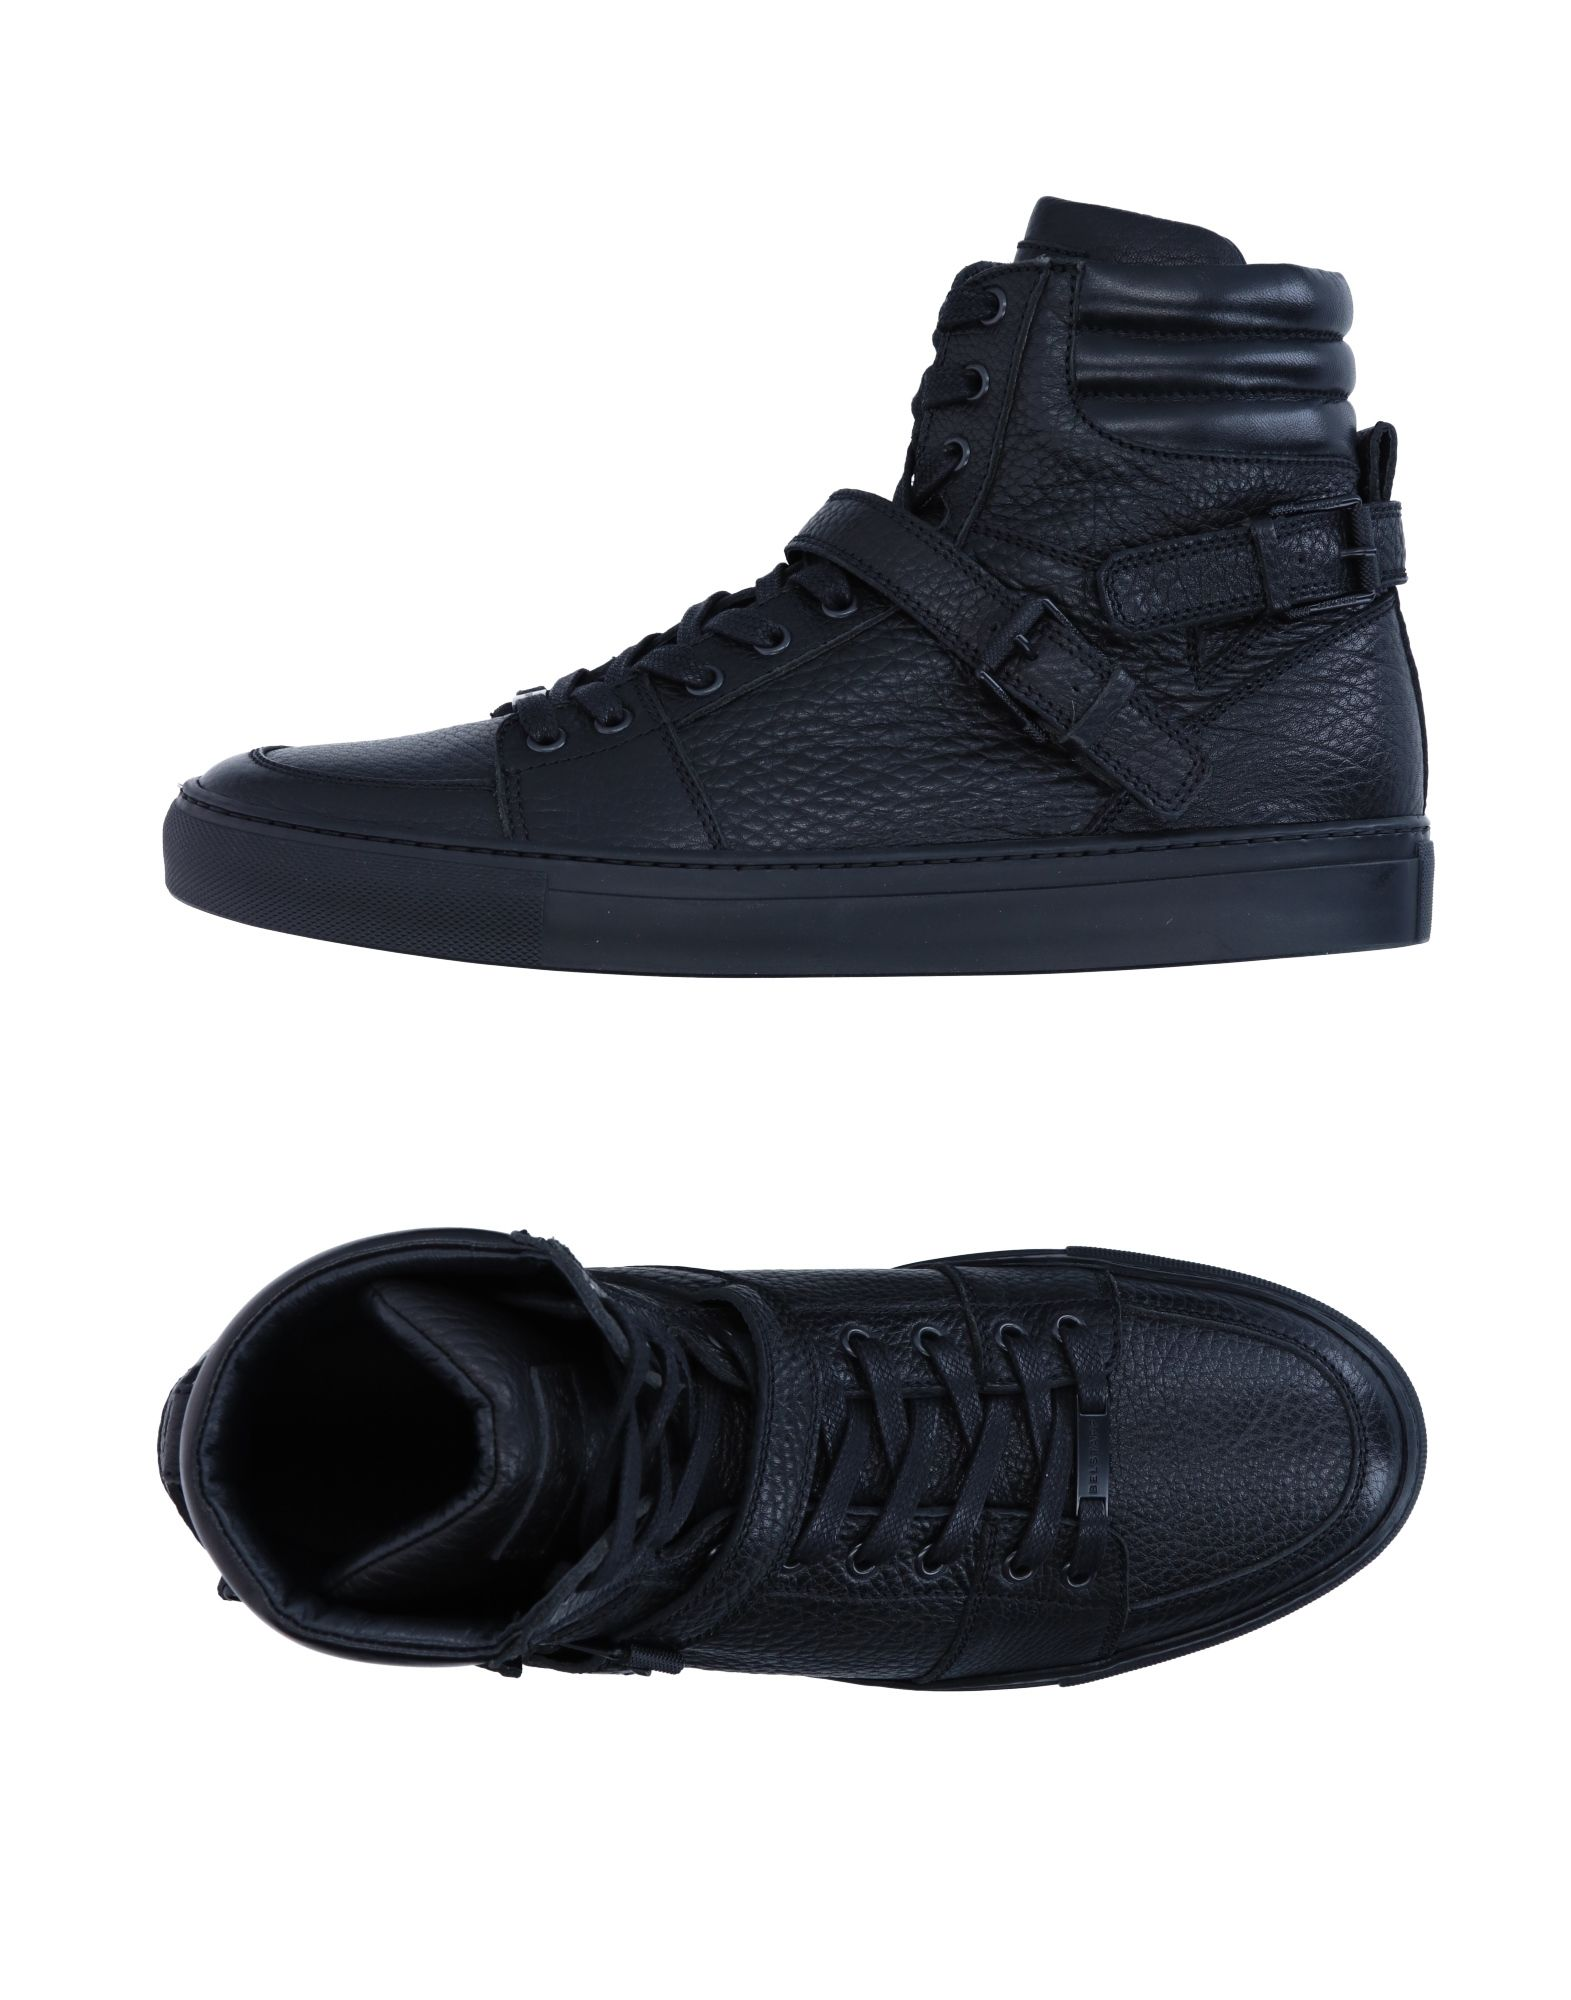 Belstaff Sneakers Herren  11283401GG Gute Qualität beliebte Schuhe